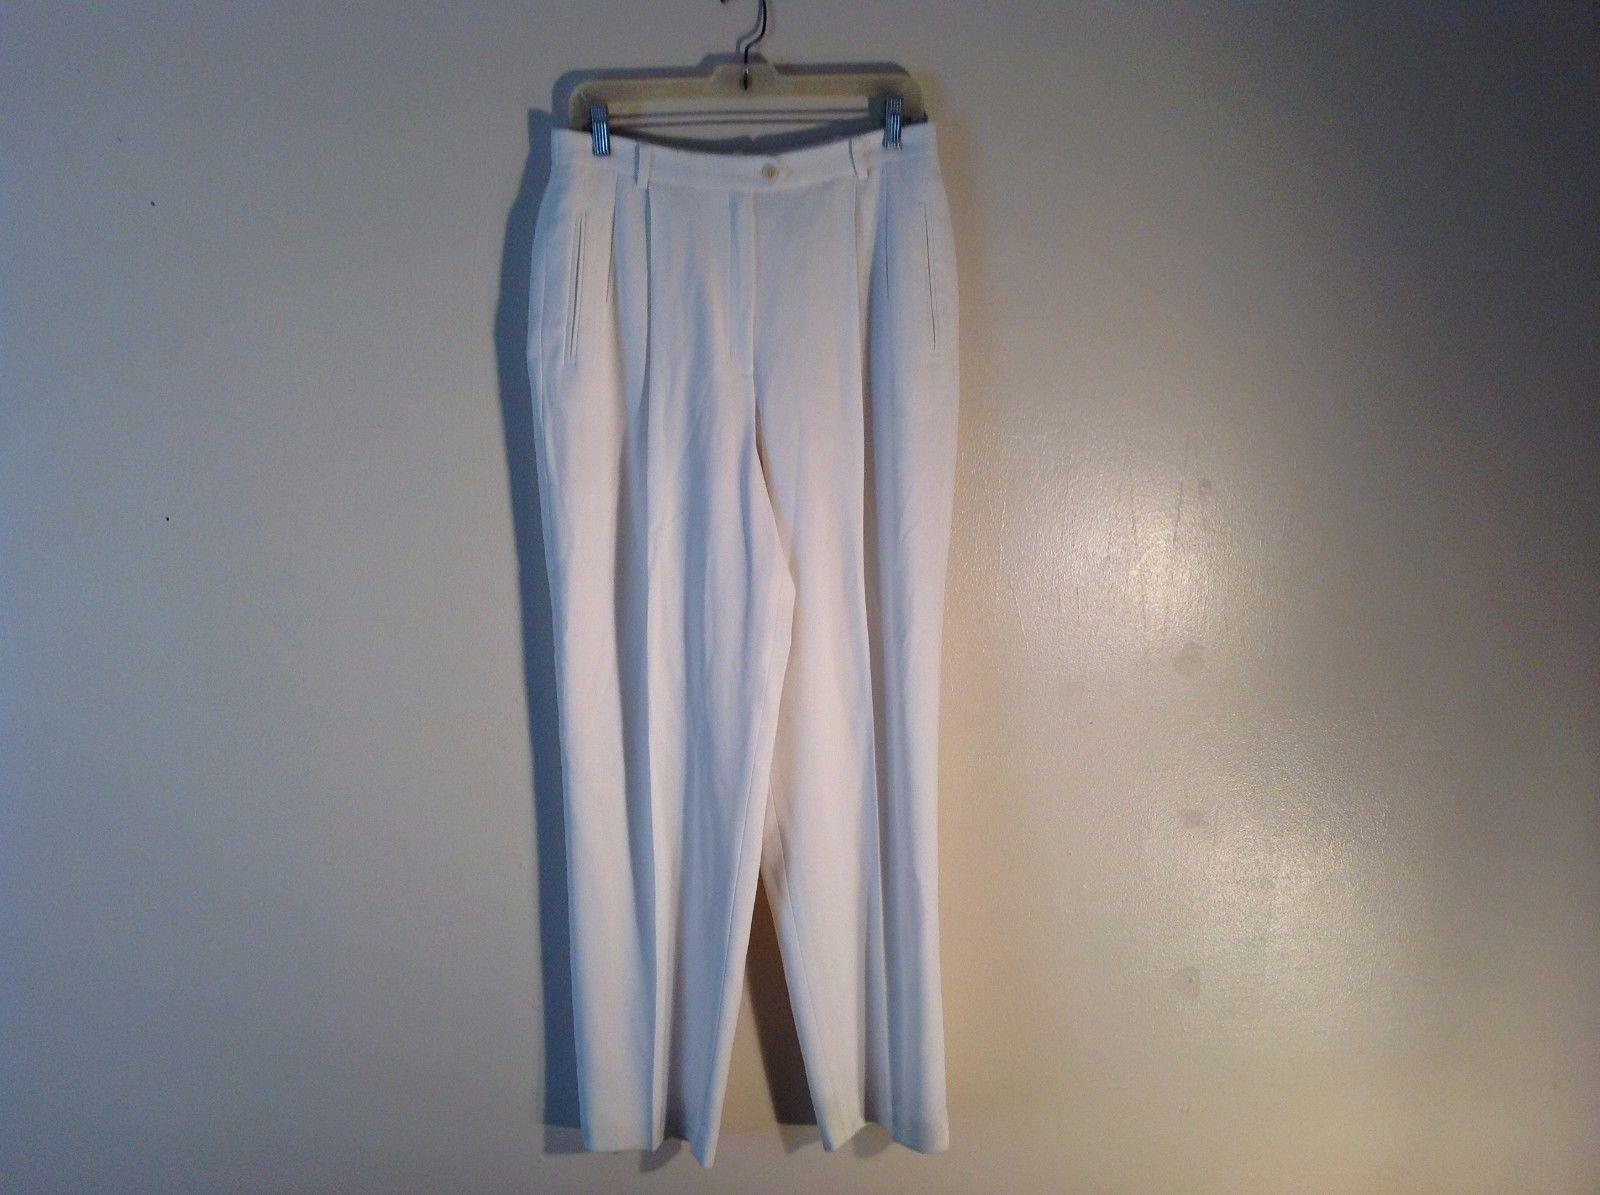 Used Condition Liz Claiborne Size 14 Loose Baggy Stylish White Dress Pants